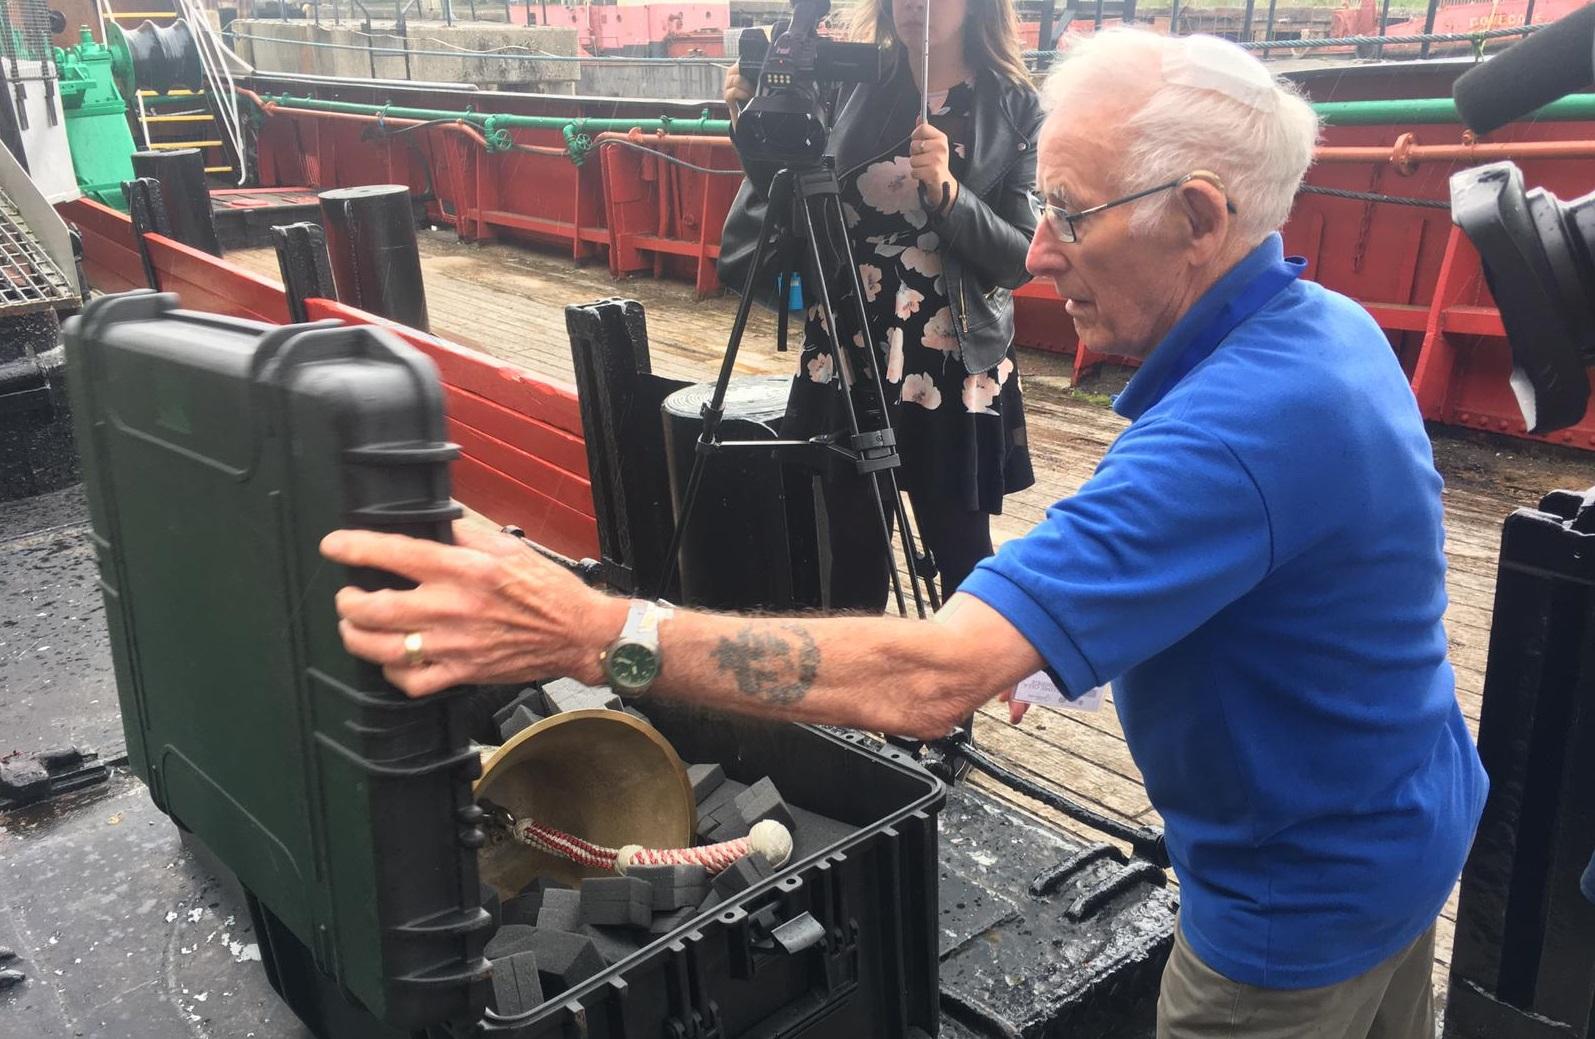 The Arctic Corsair's bell is carefully packed away by volunteer Trevor Evans.